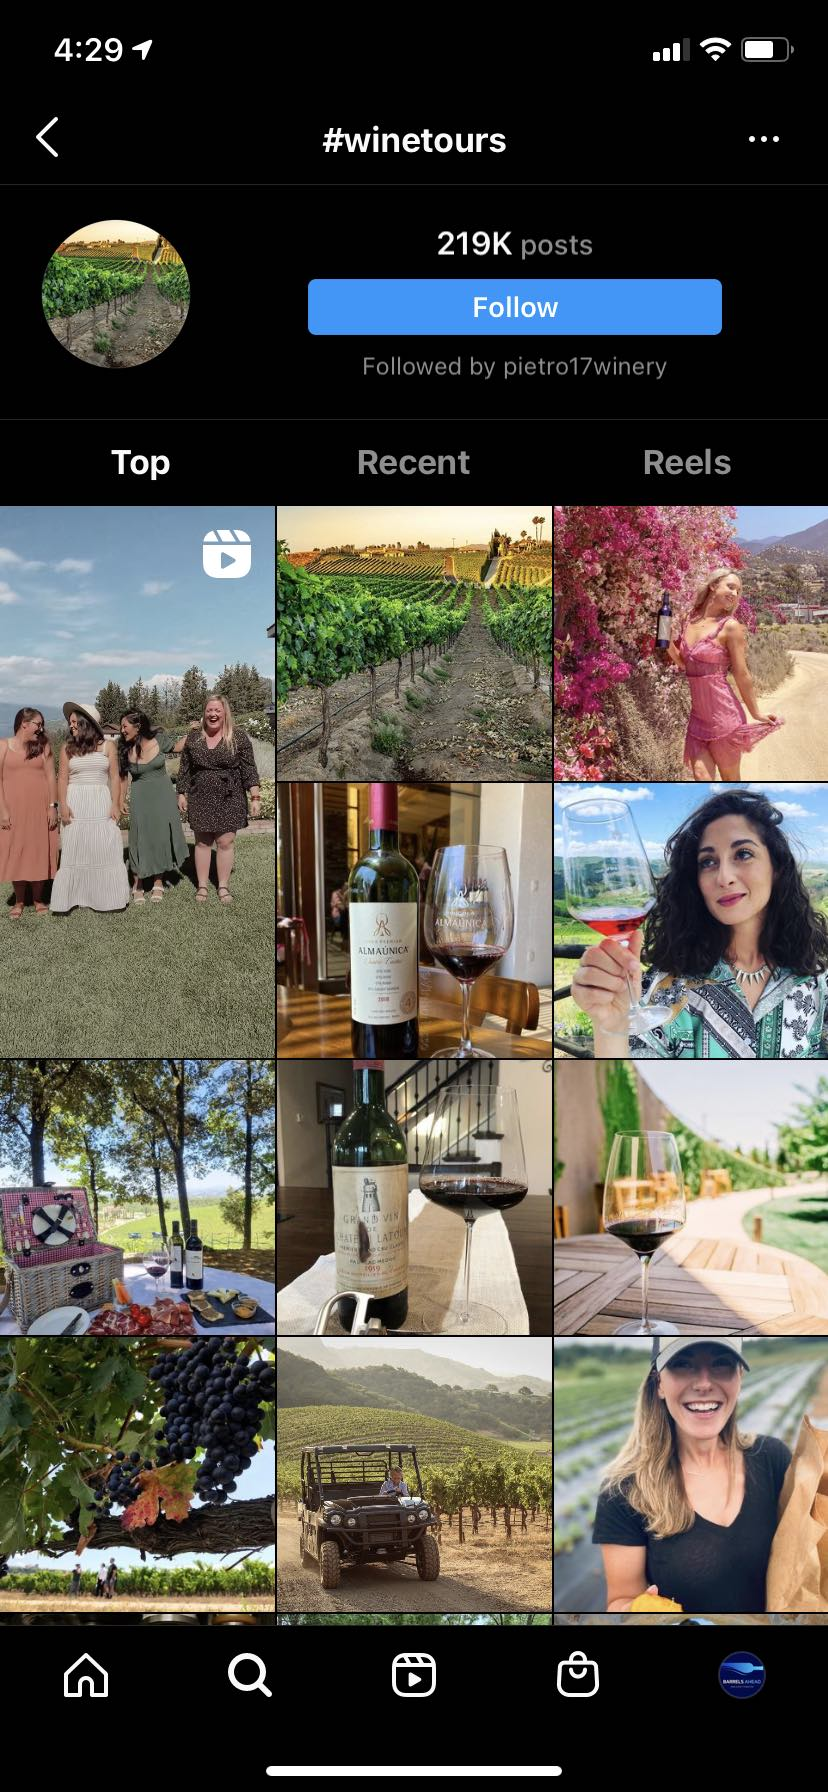 #winetours